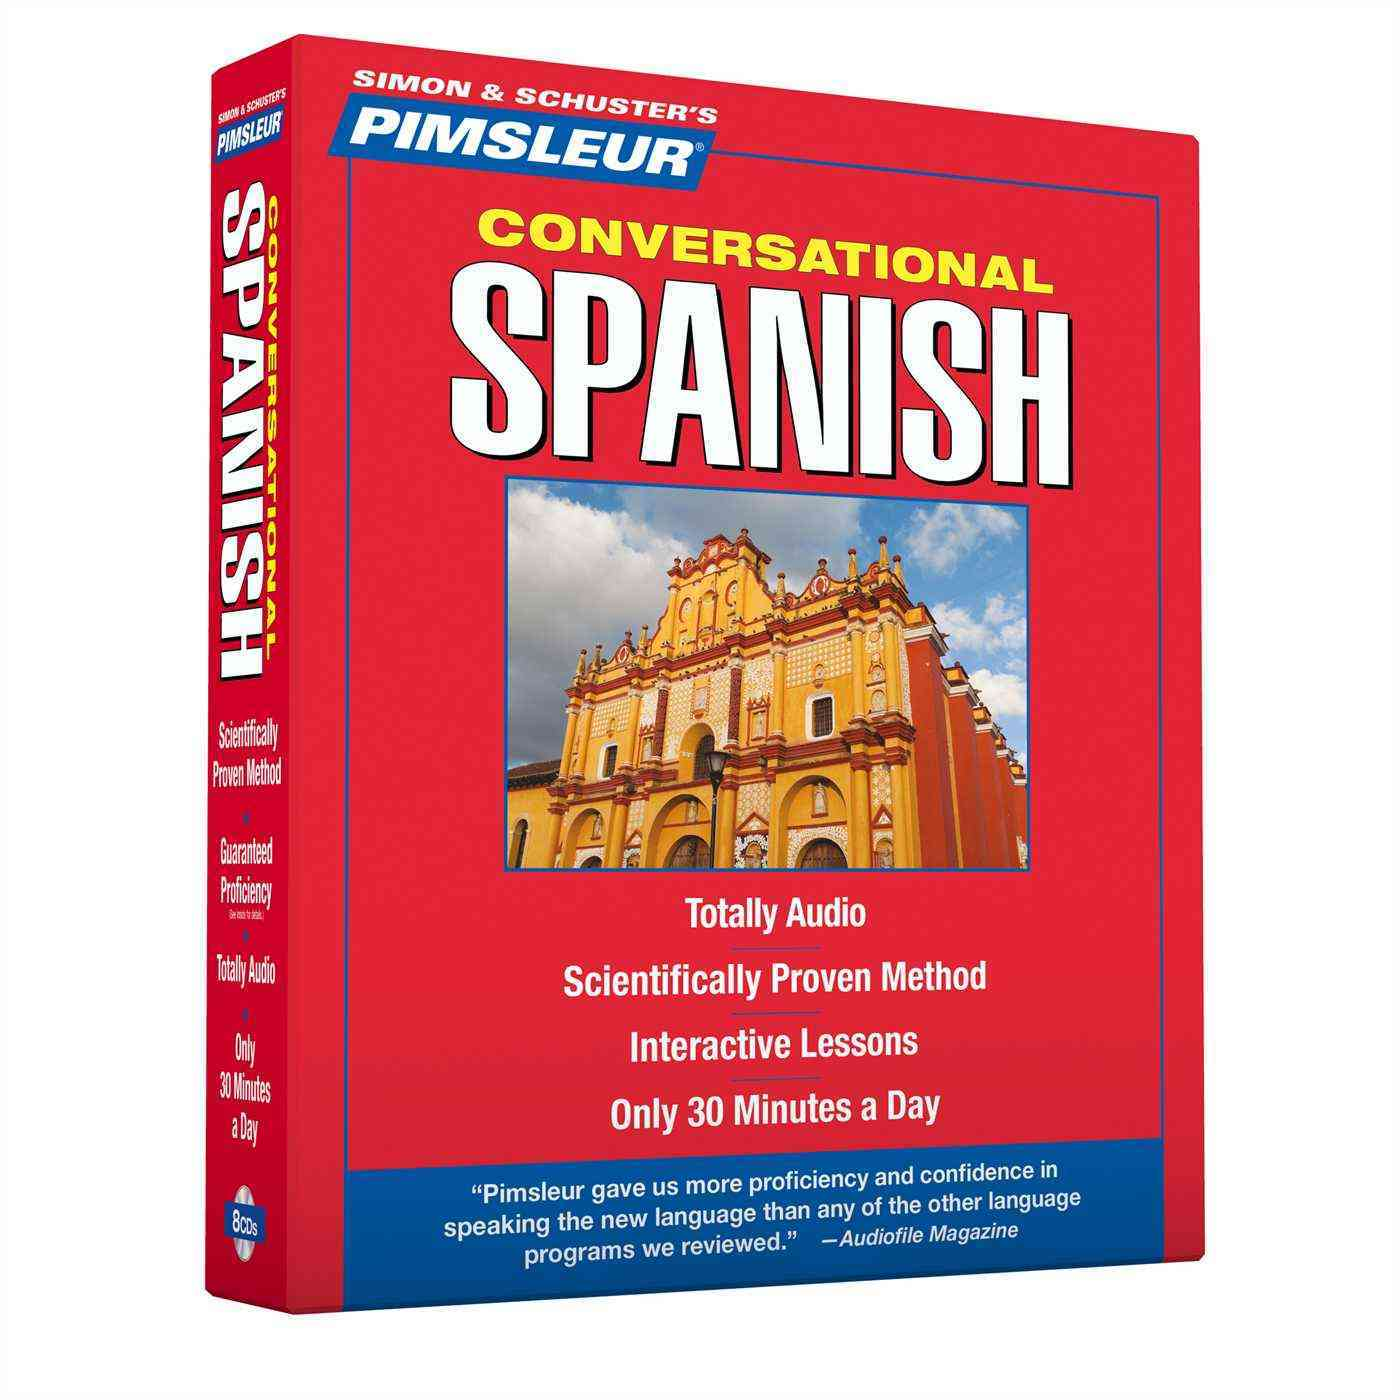 Pimsleur Conversational Spanish (CD-Audio)